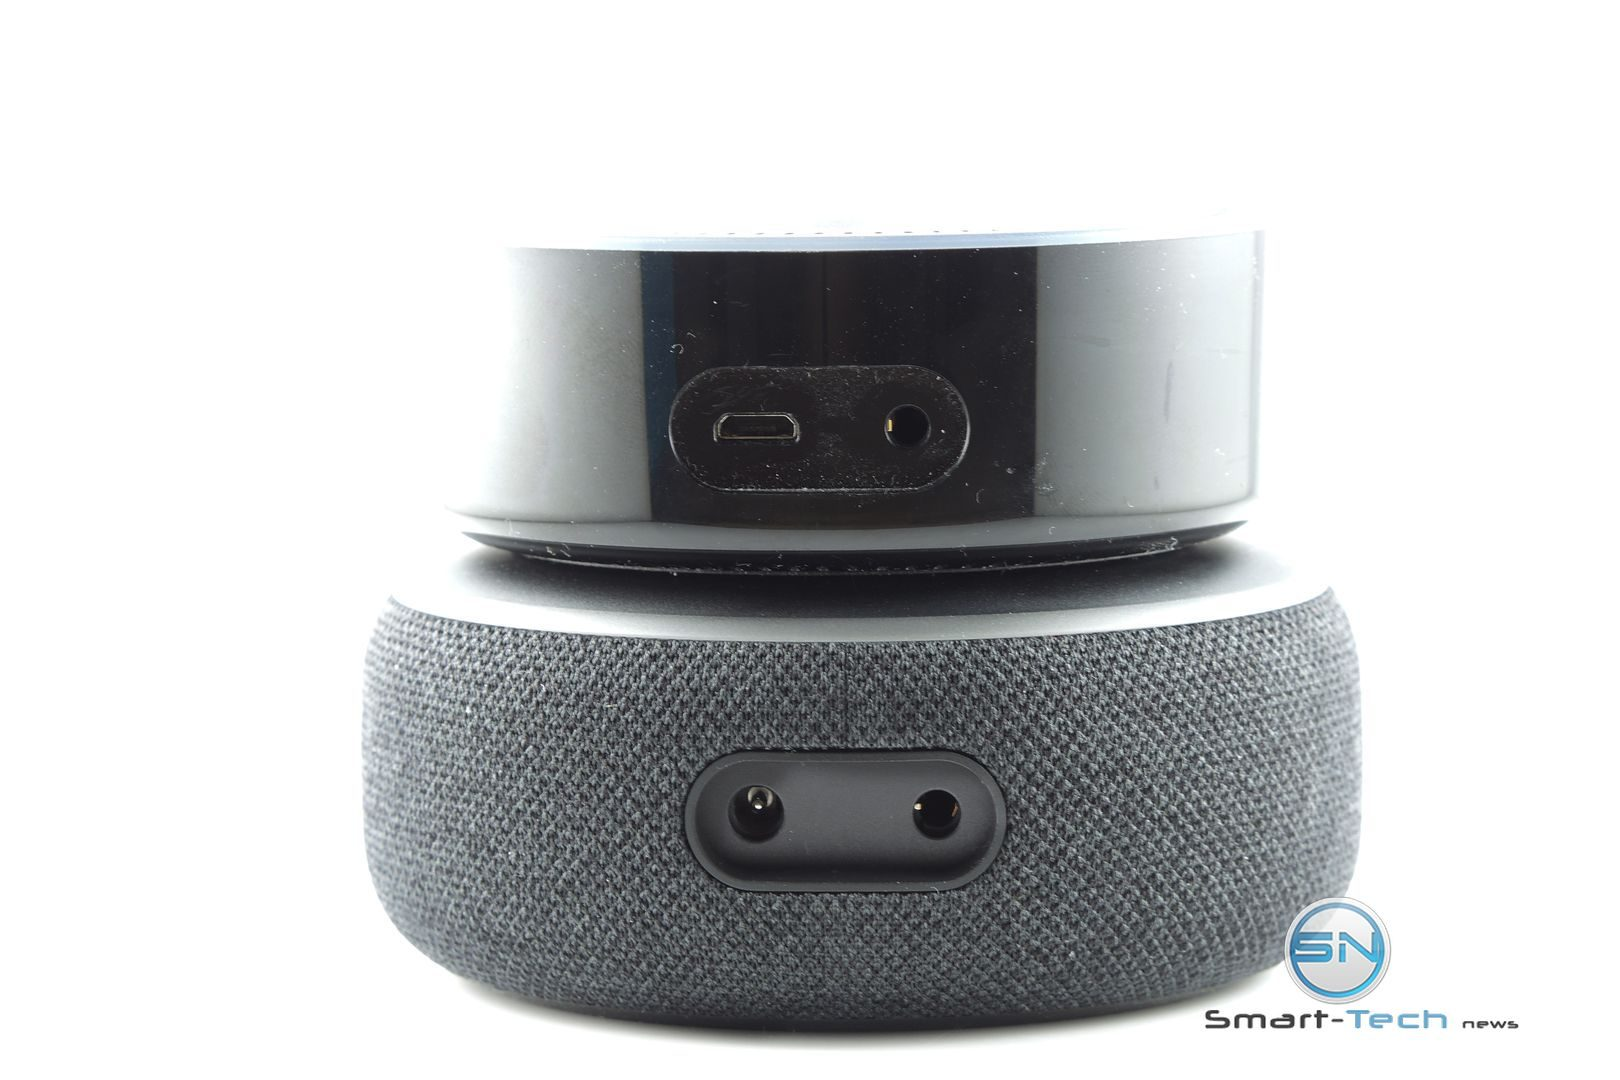 amazon echo dot 3 new generation smart tech news. Black Bedroom Furniture Sets. Home Design Ideas